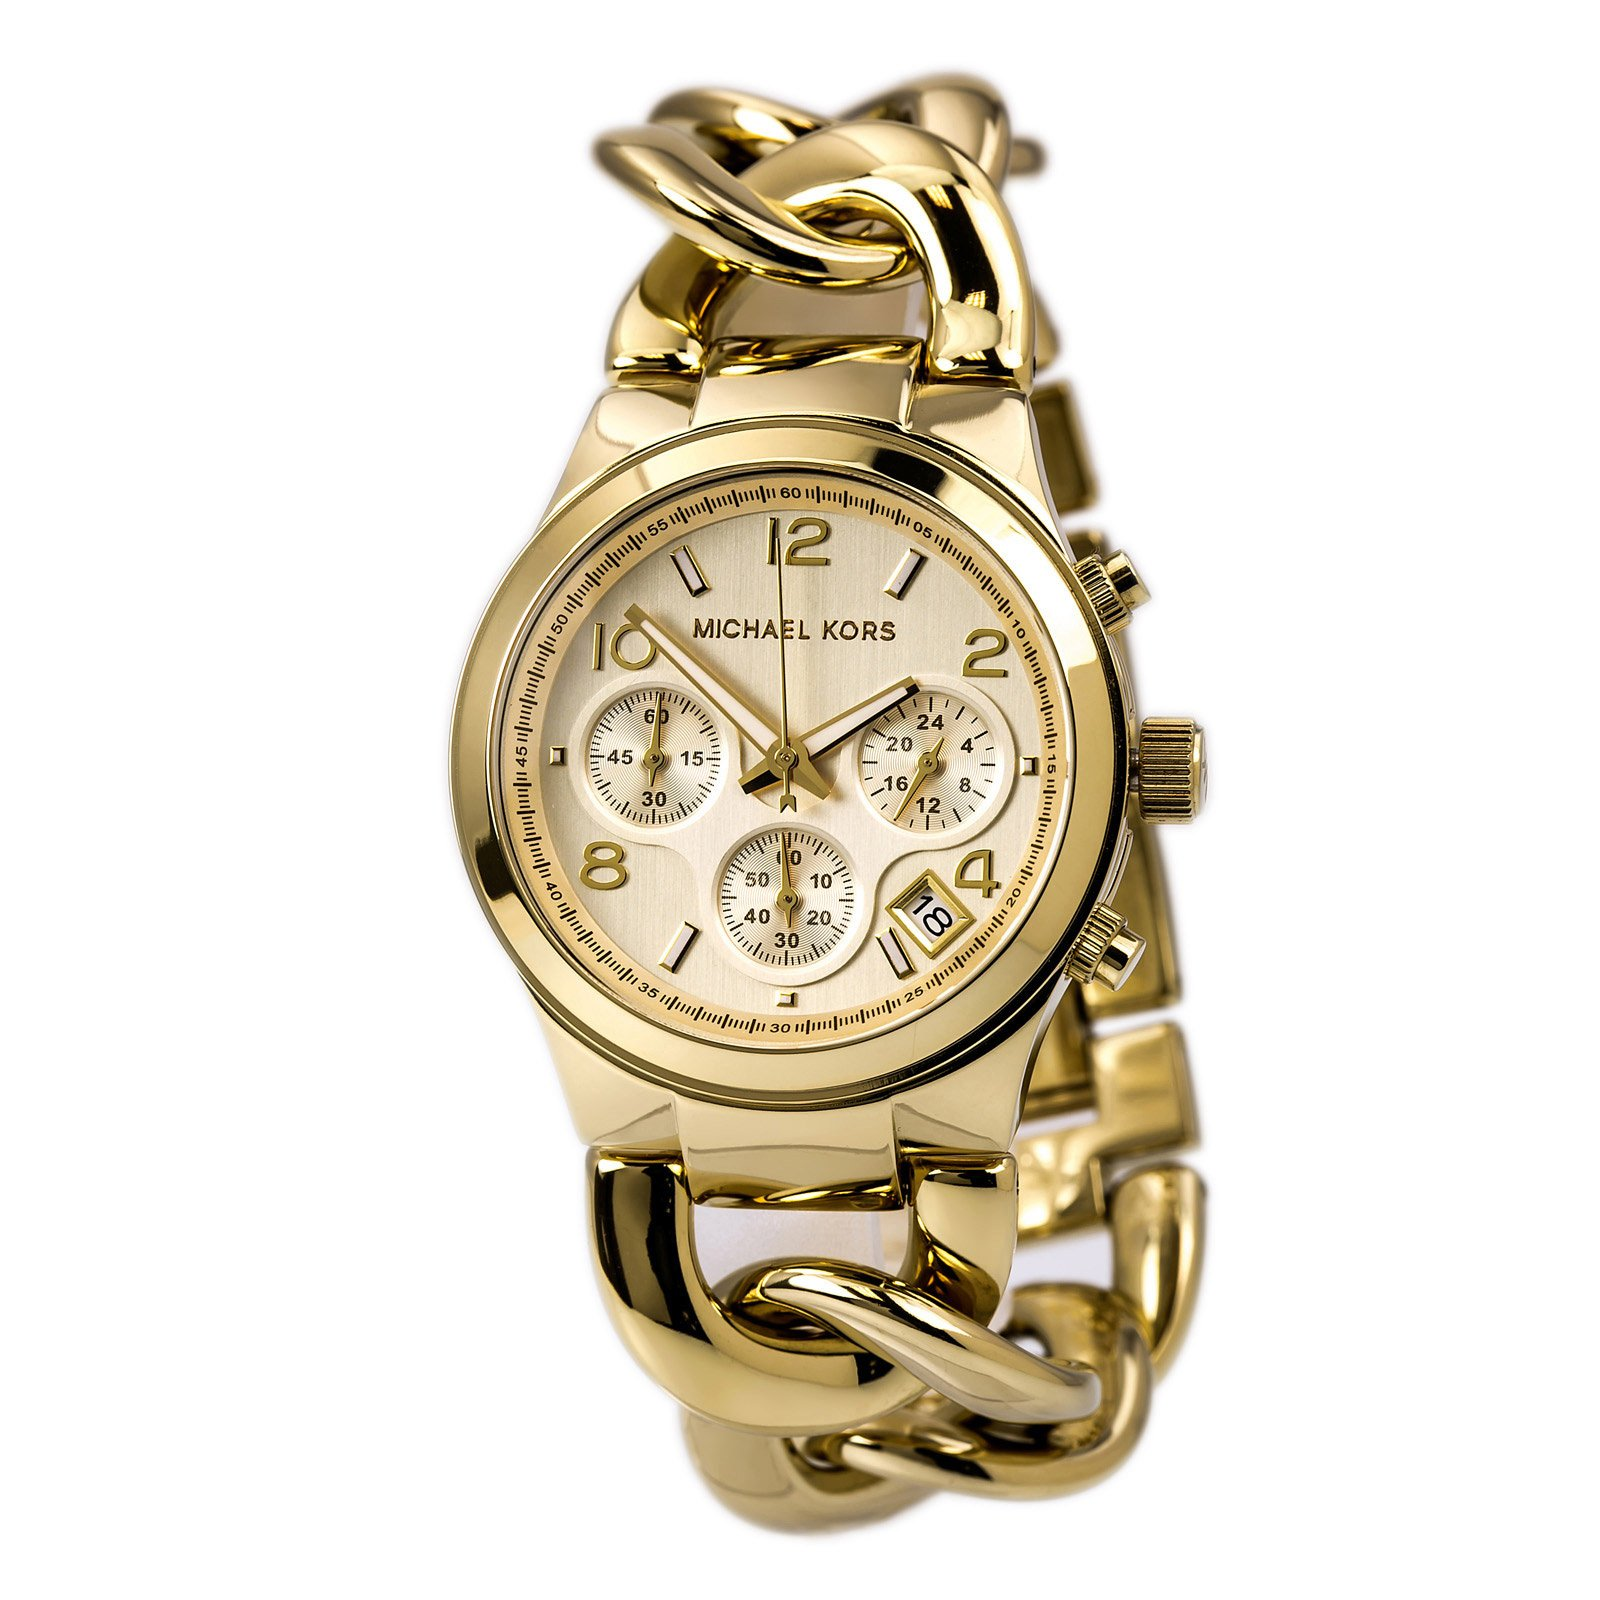 Michael Kors Gold Tone Chronograph MK3131